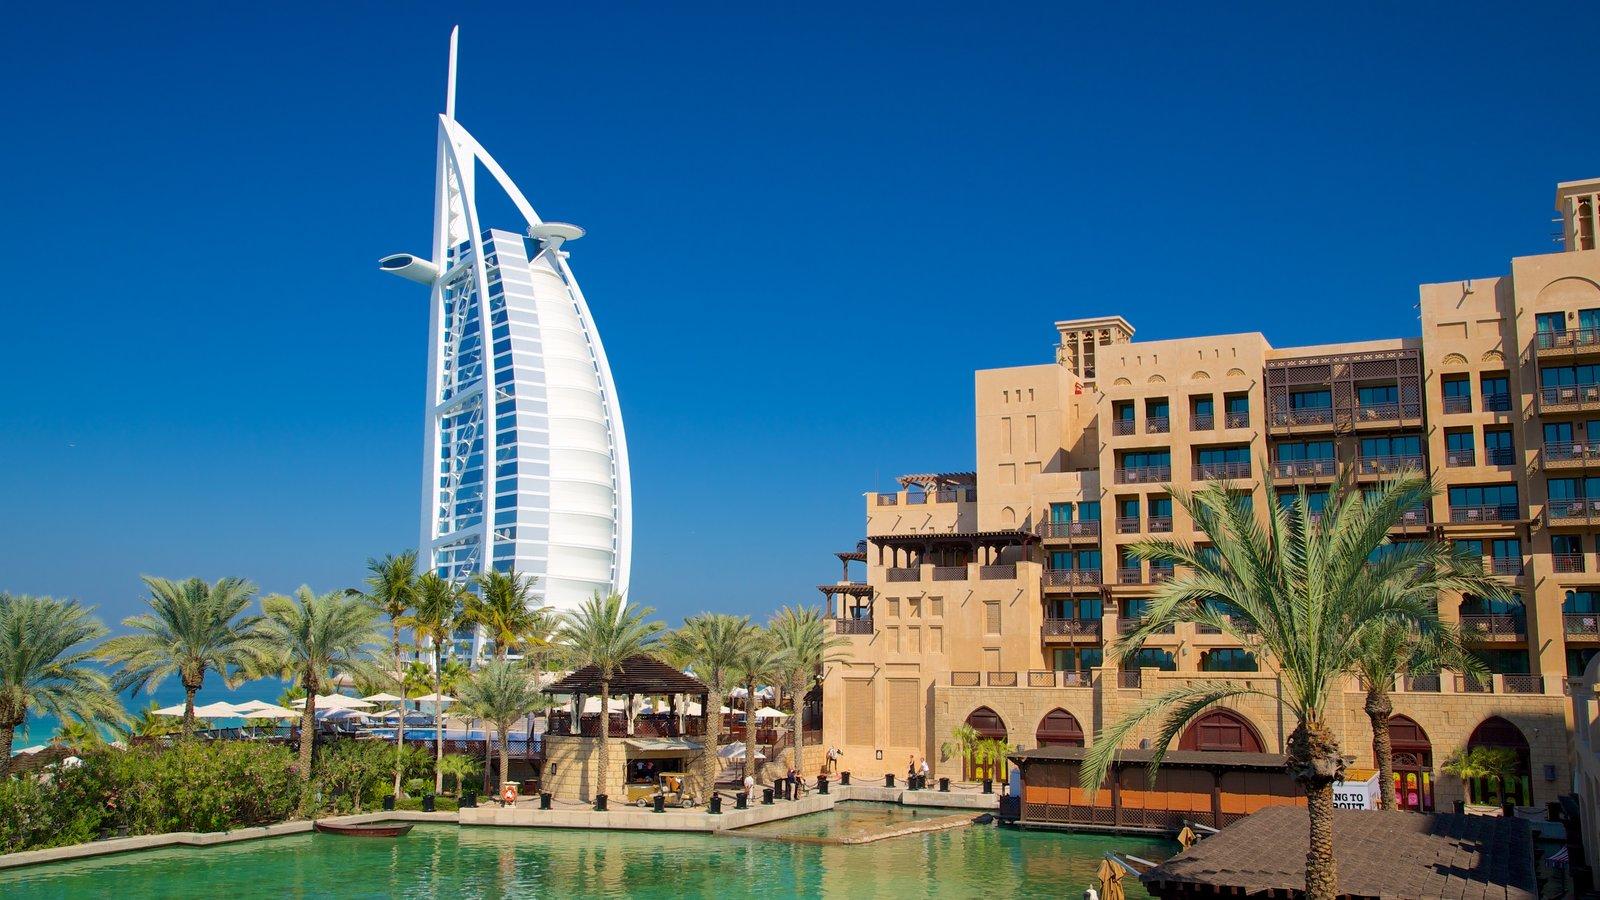 Dubai emirate pictures view photos images of dubai emirate for Arabian hotel